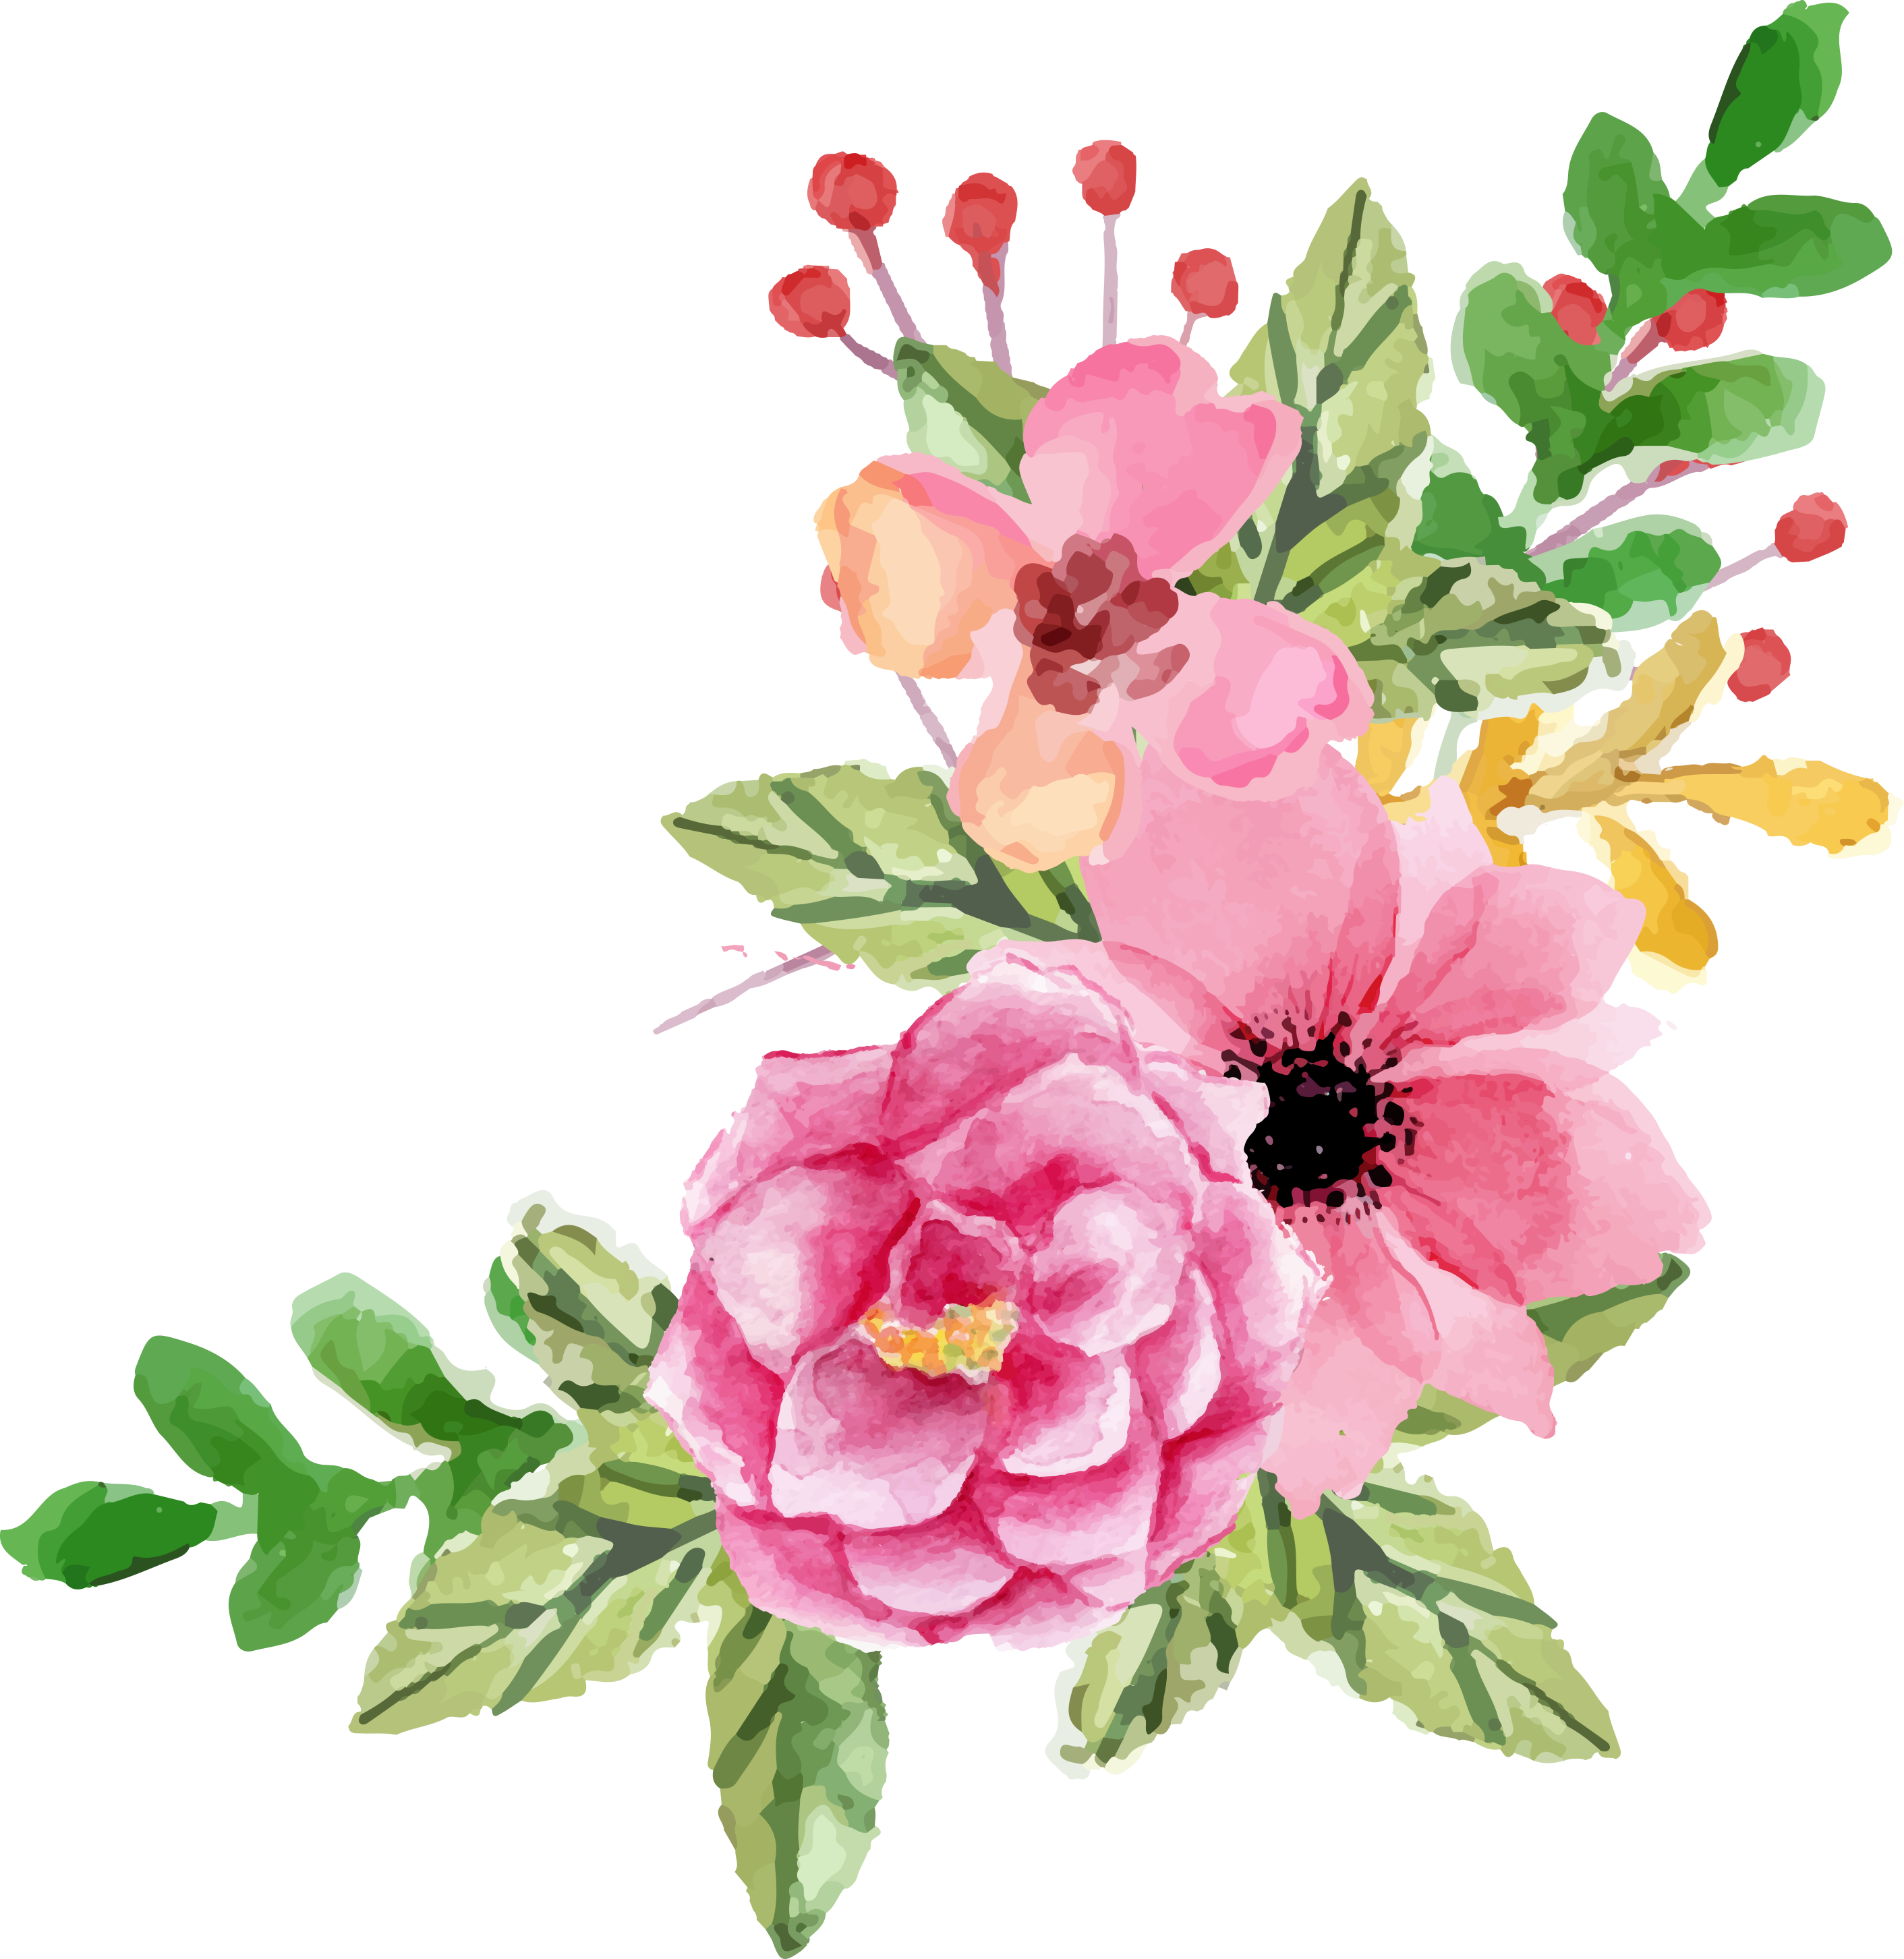 Flower clipart boho image download valentines-day-flower-elements-FPTFY-11.png (PNG Image, 2823 × 2905 ... image download